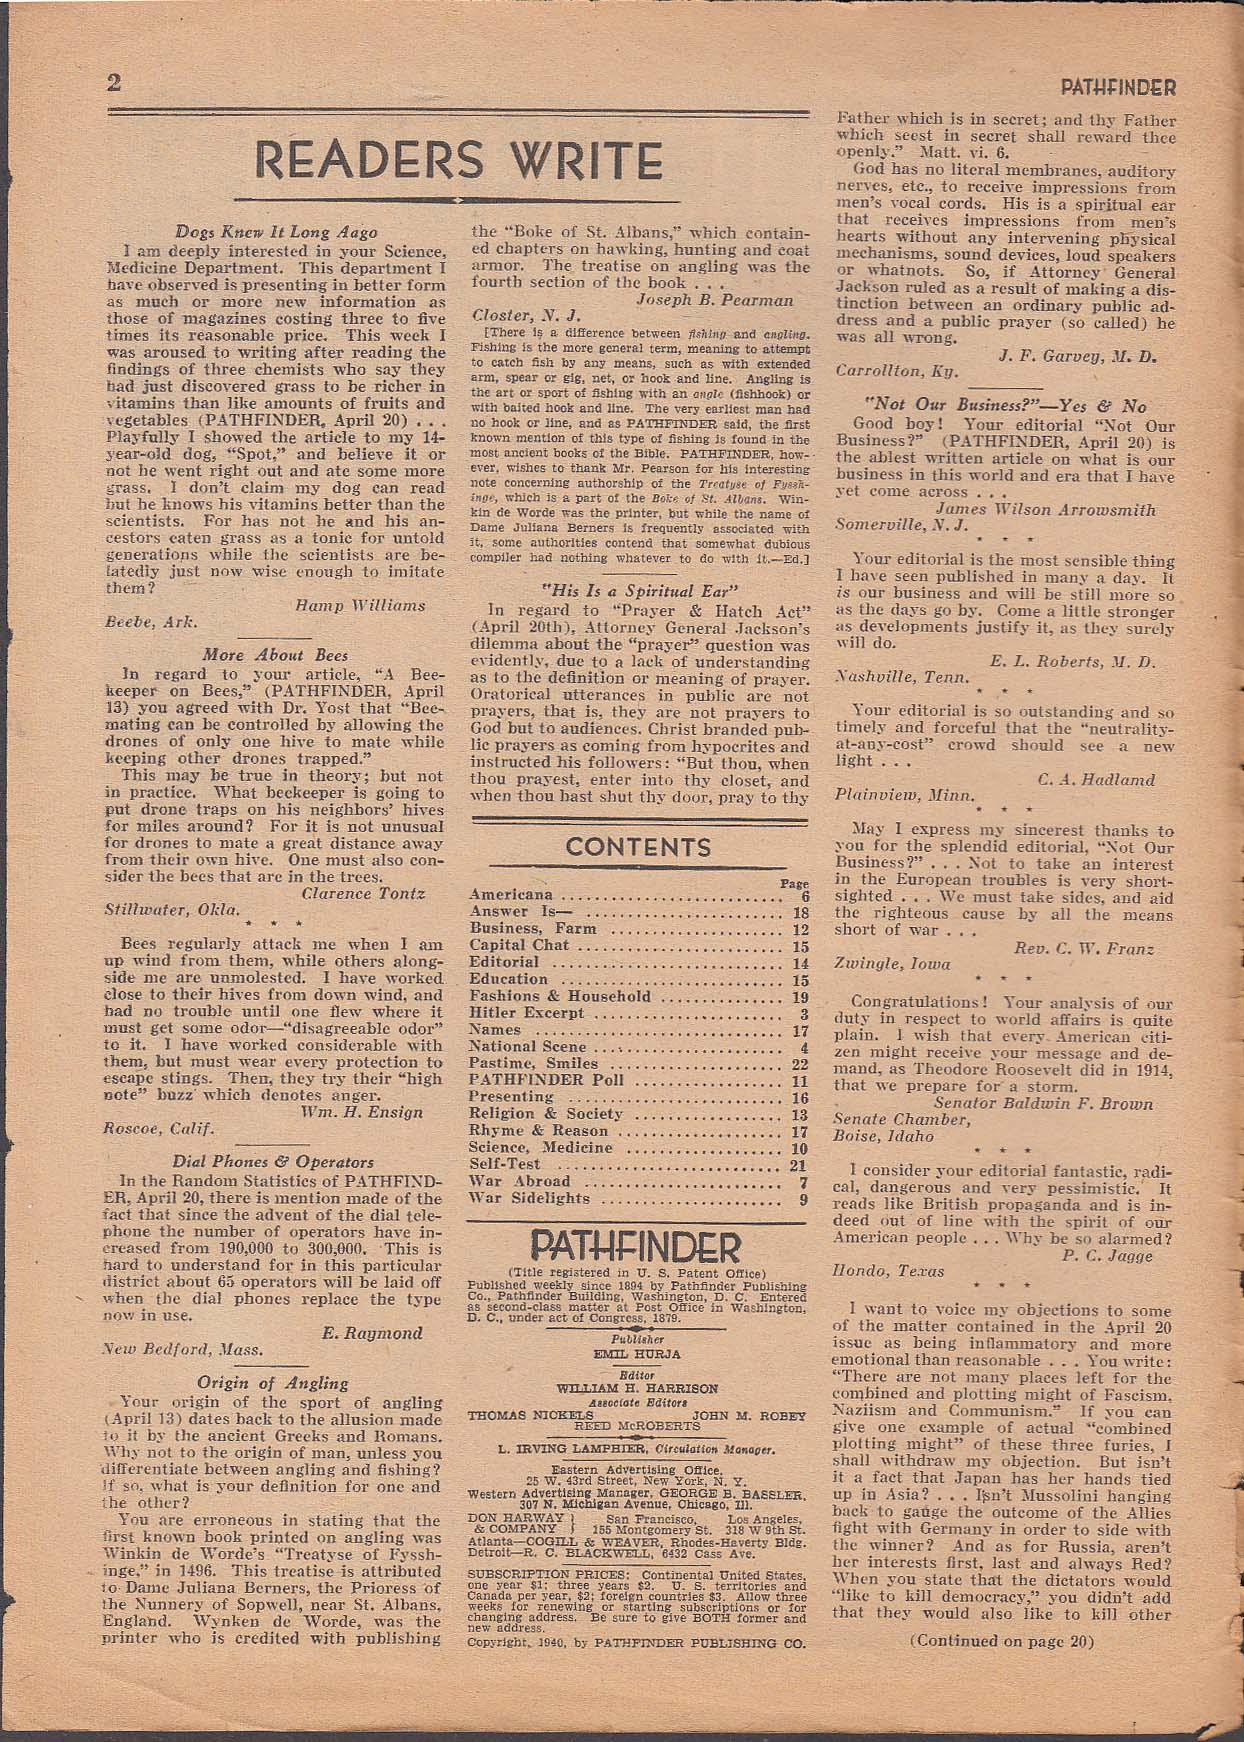 PATHFINDER Harold Stassen; Mein Kampf; Goebbels; FDR + 5/11 1940